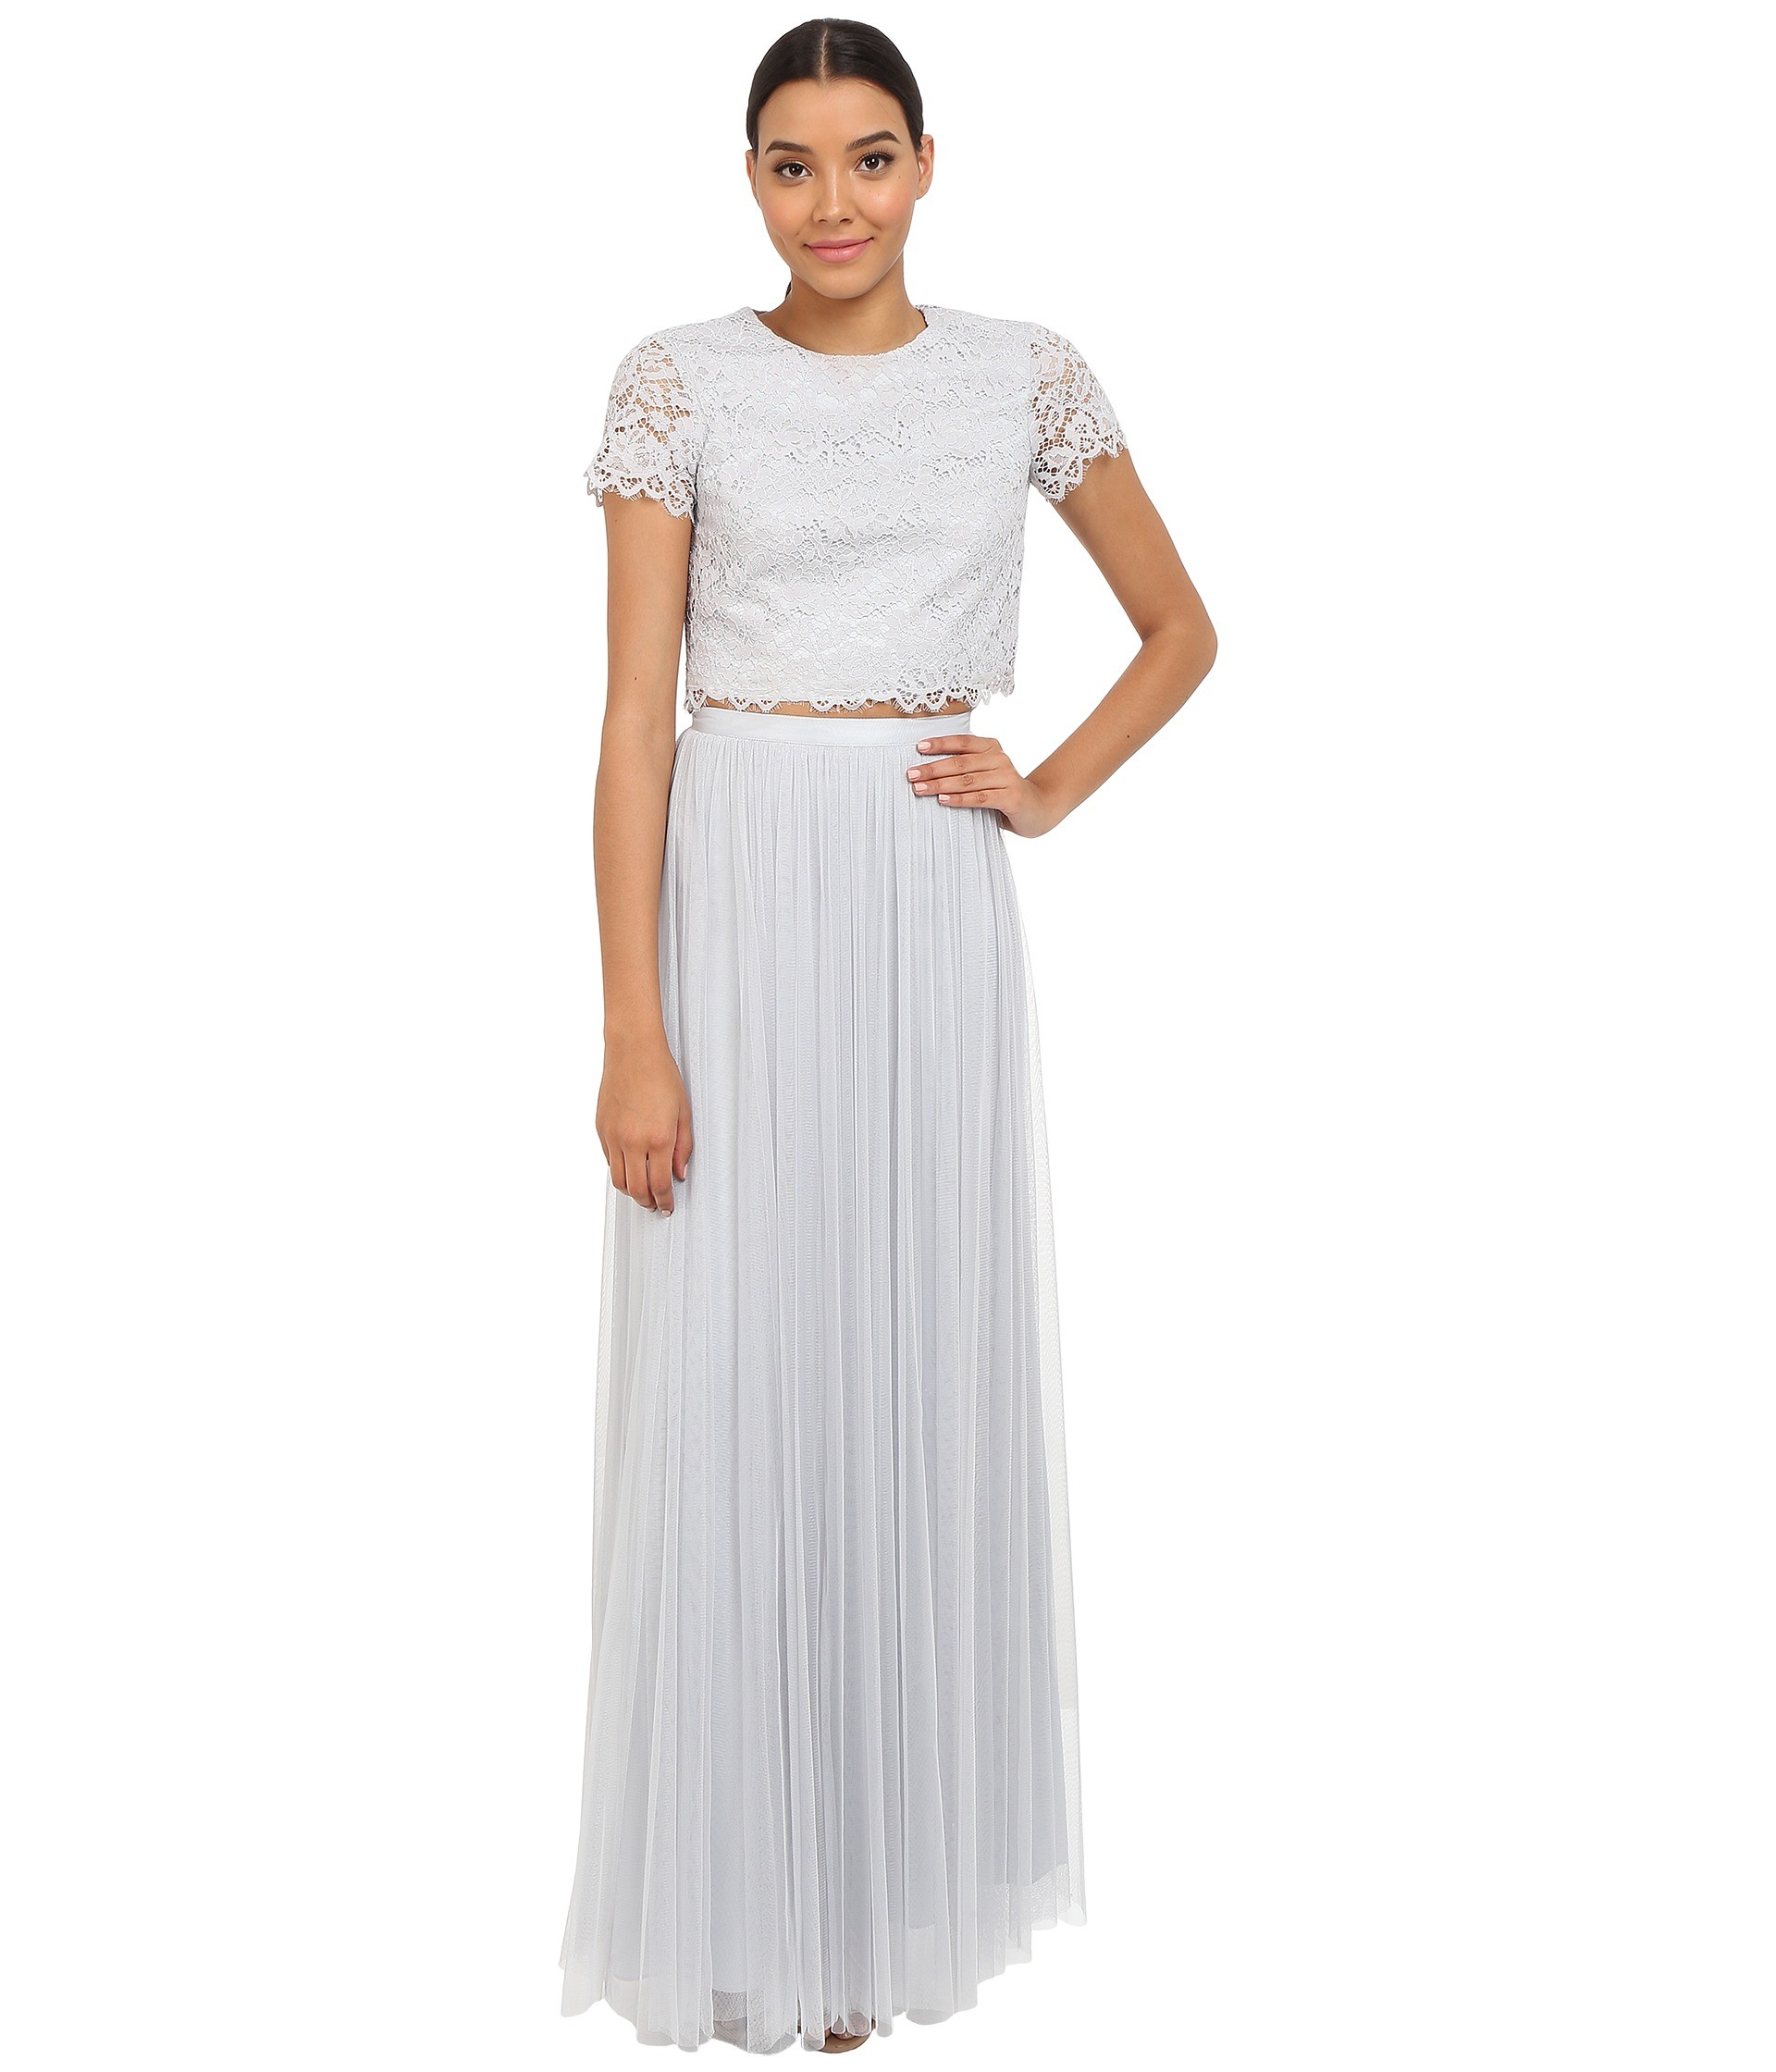 Shop More Two Piece Wedding Dresses